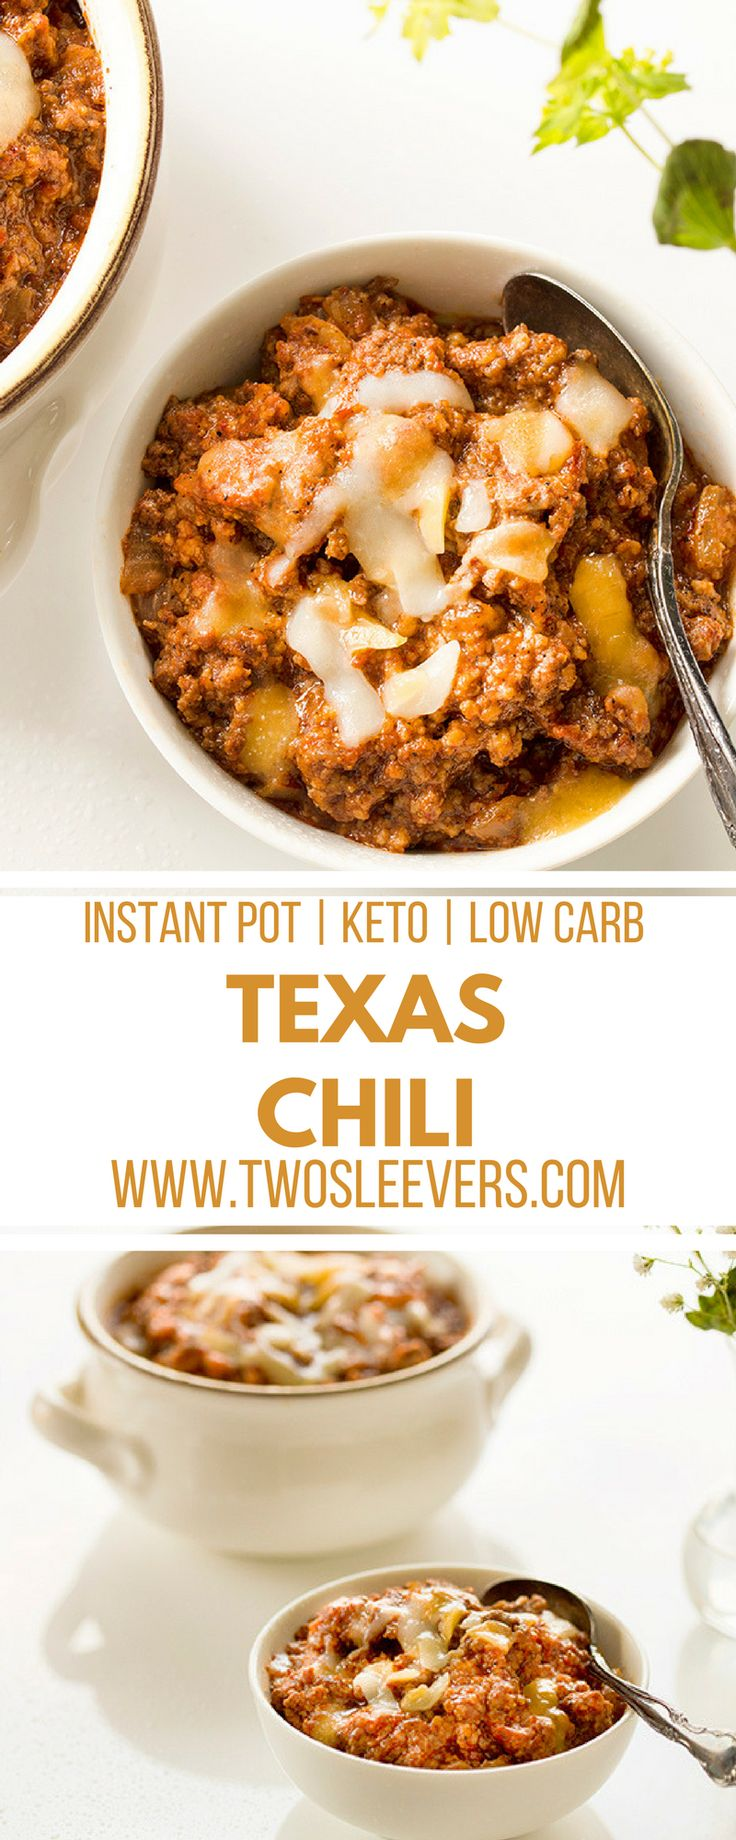 Instant pot low carb chili recipe. Keto friendly.| Two Sleevers #instantpotchili #chilirecipe #instantpotdinner